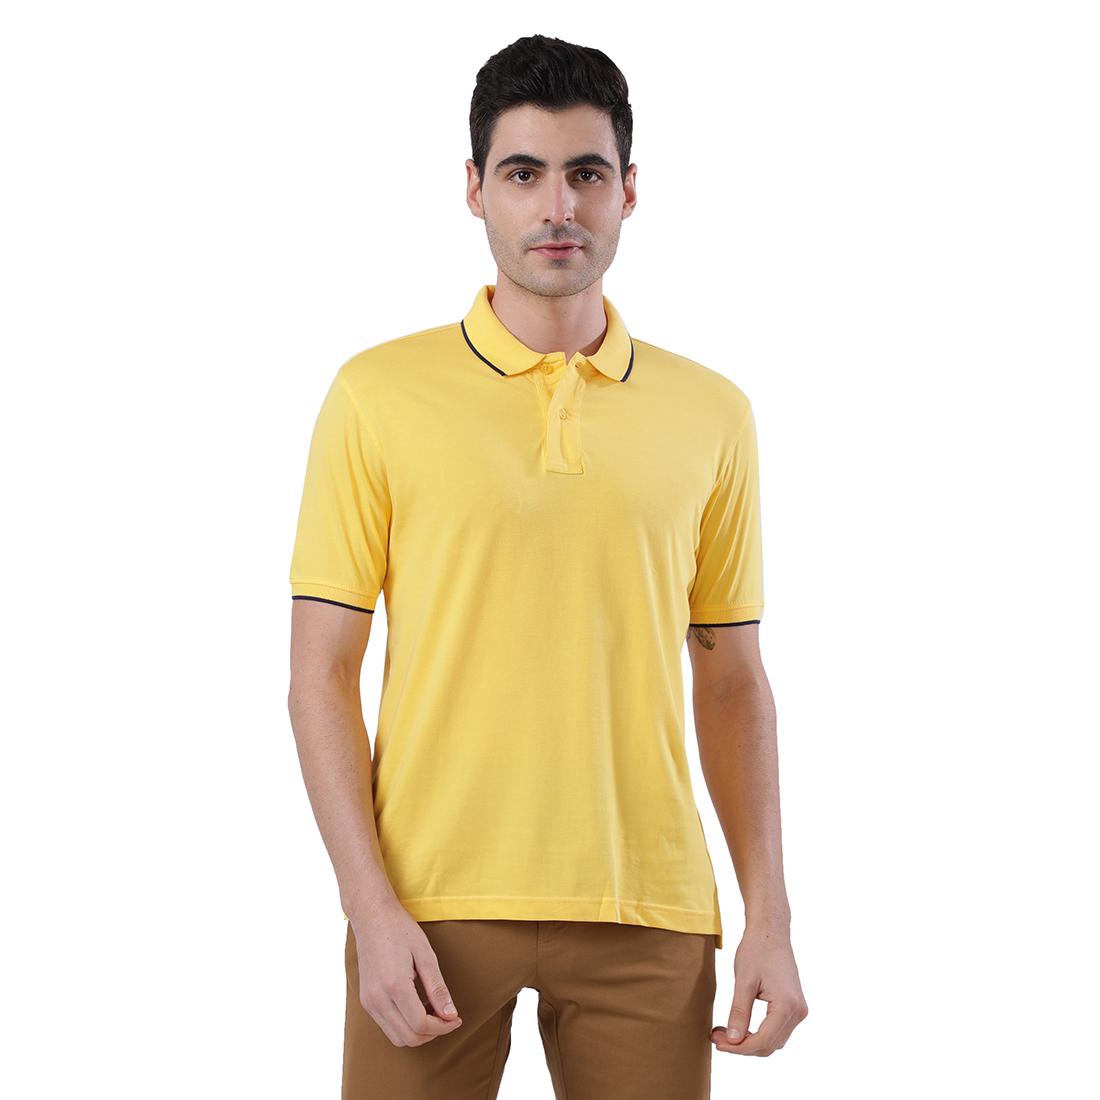 Next Look | Next Look Medium Yellow T-Shirt